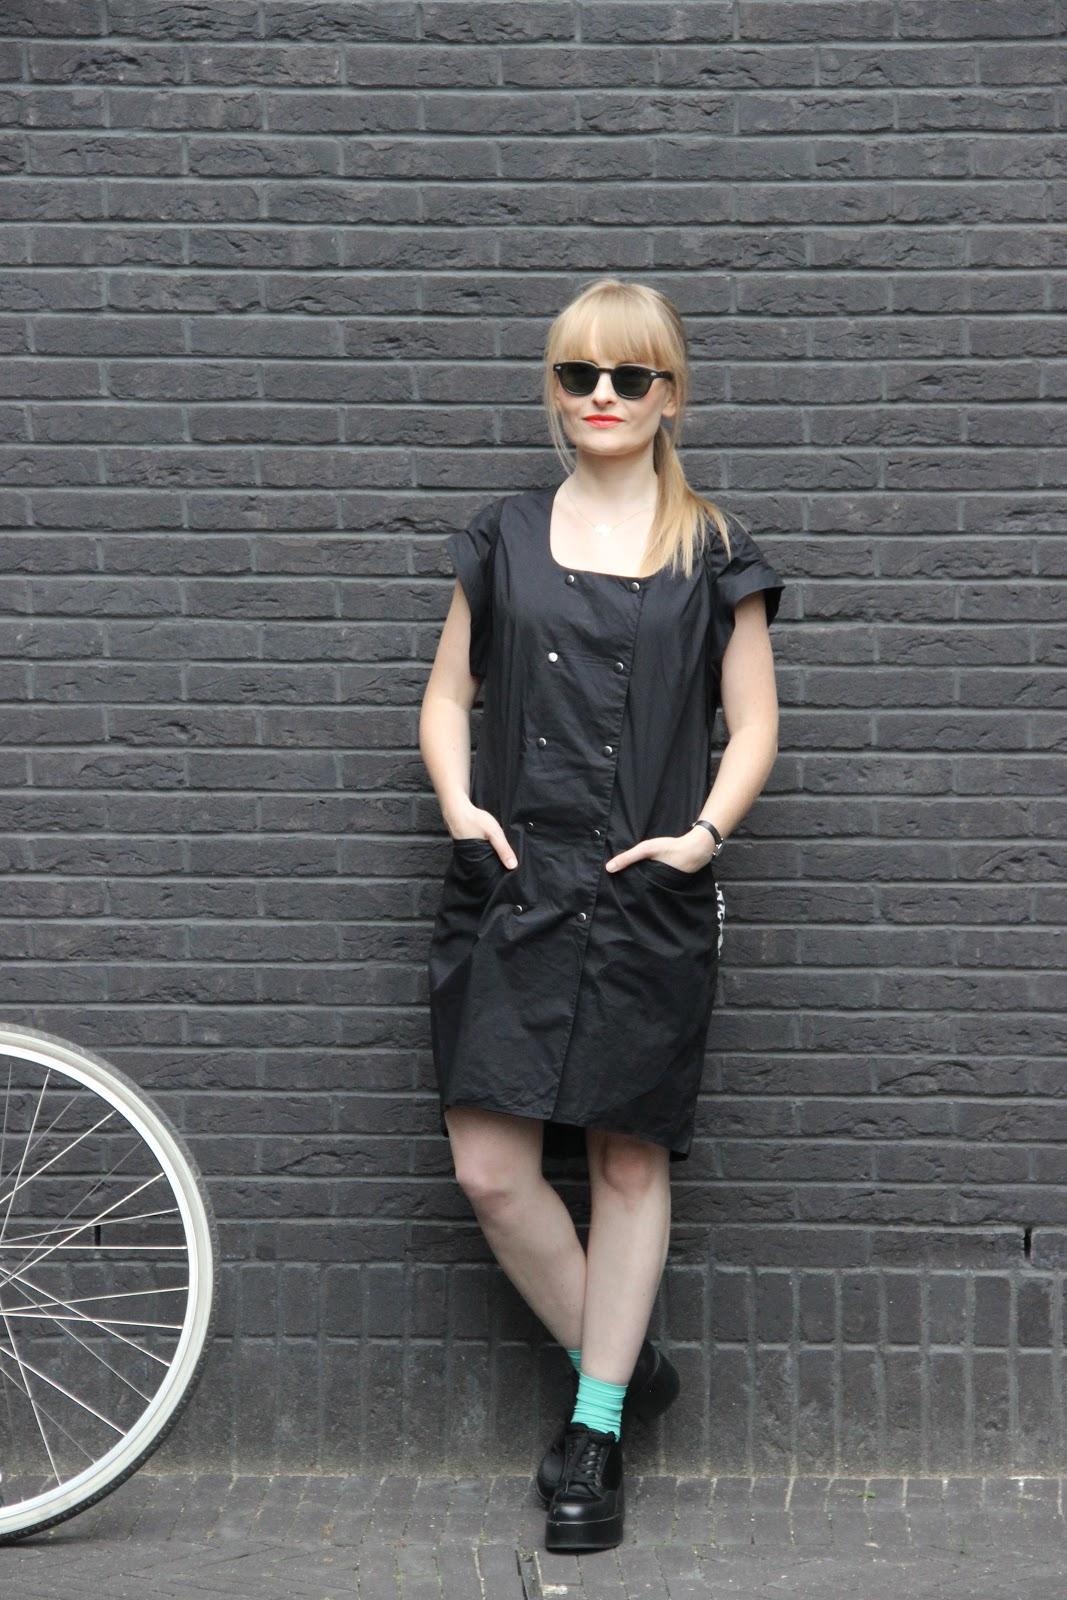 Rowerowa moda by FASHION ART MEDIA